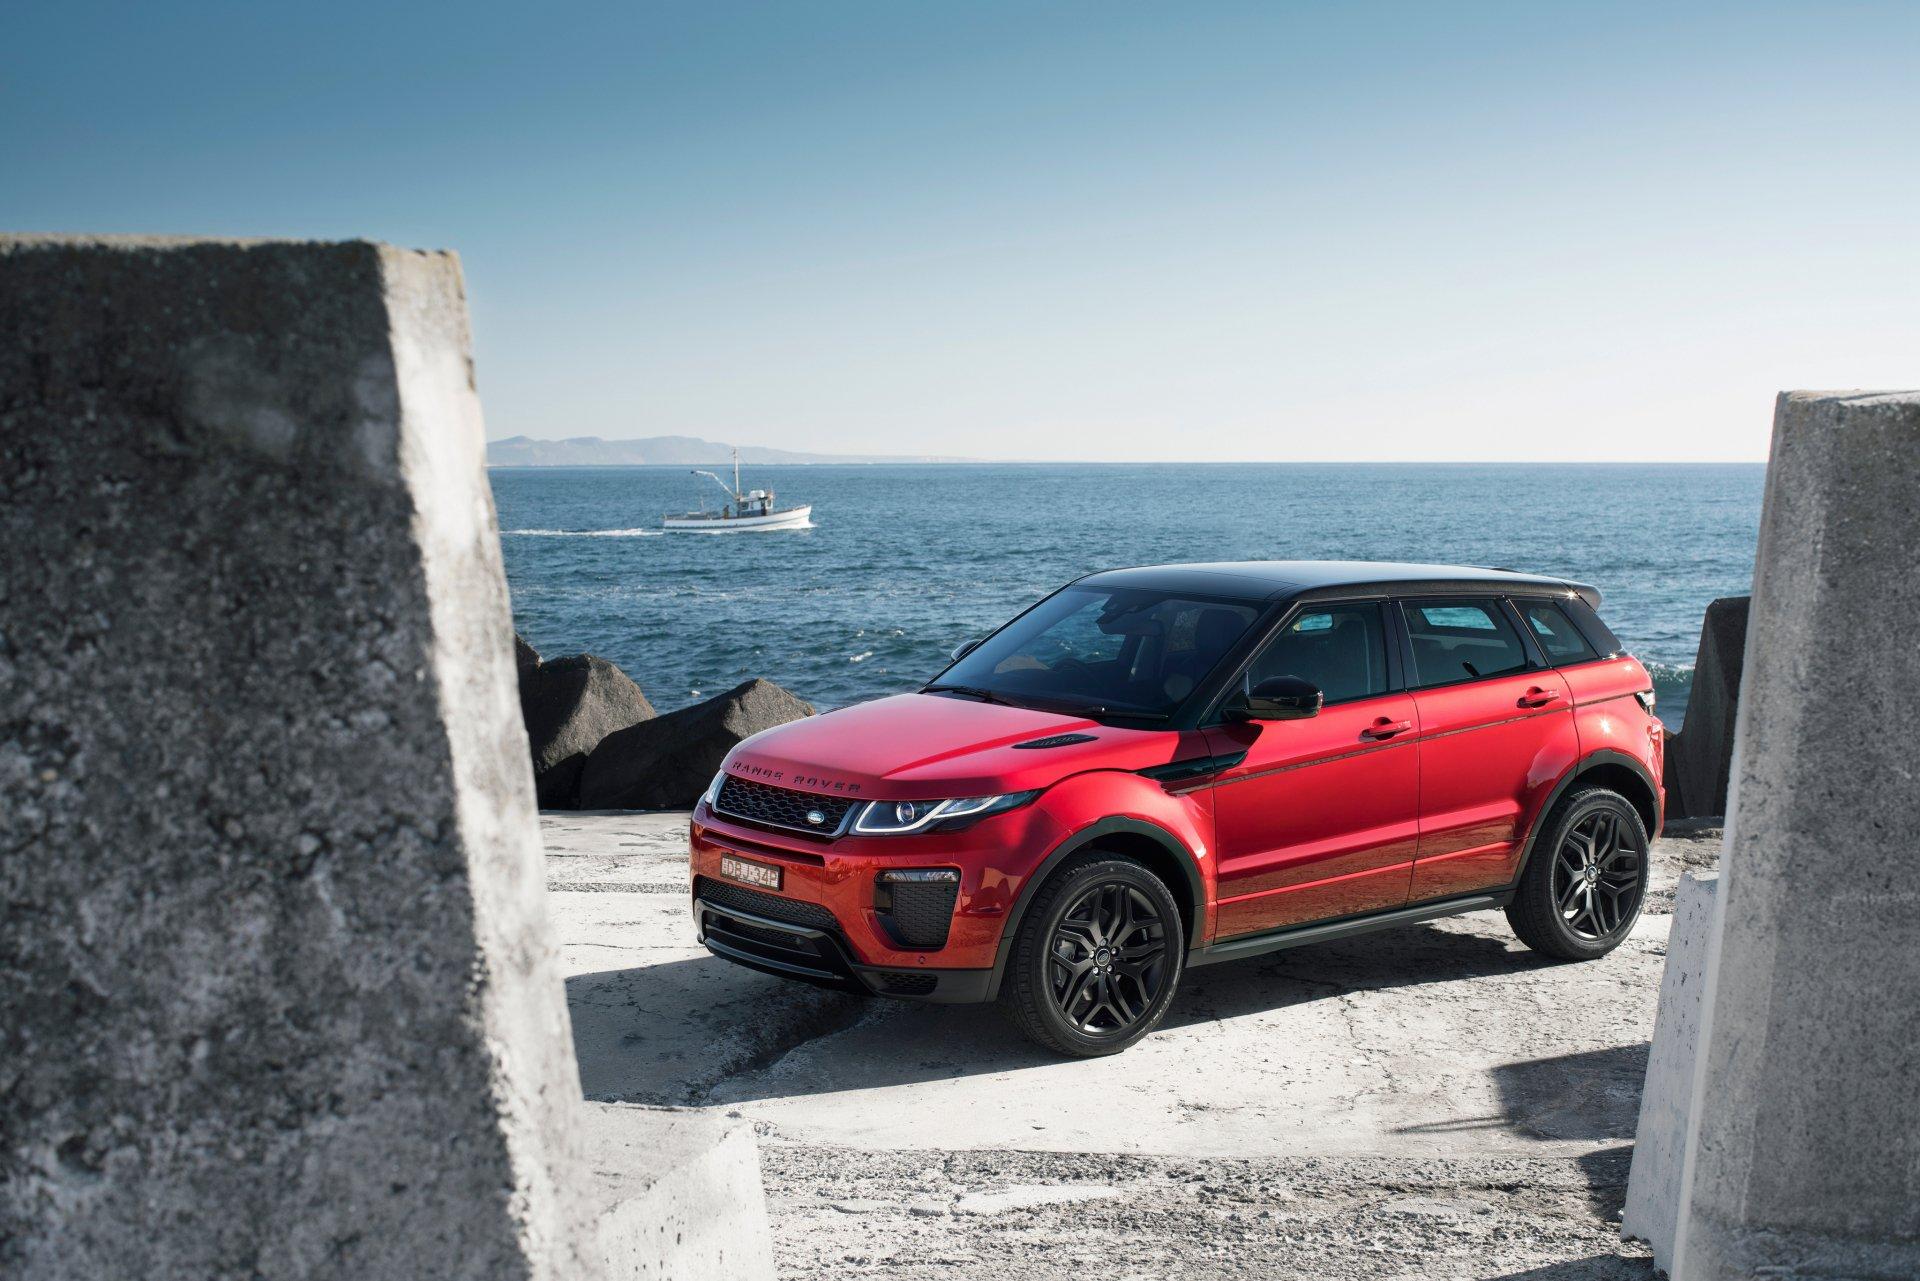 Vehicles - Range Rover Evoque  Range Rover Car Vehicle Red Car SUV Luxury Car Wallpaper